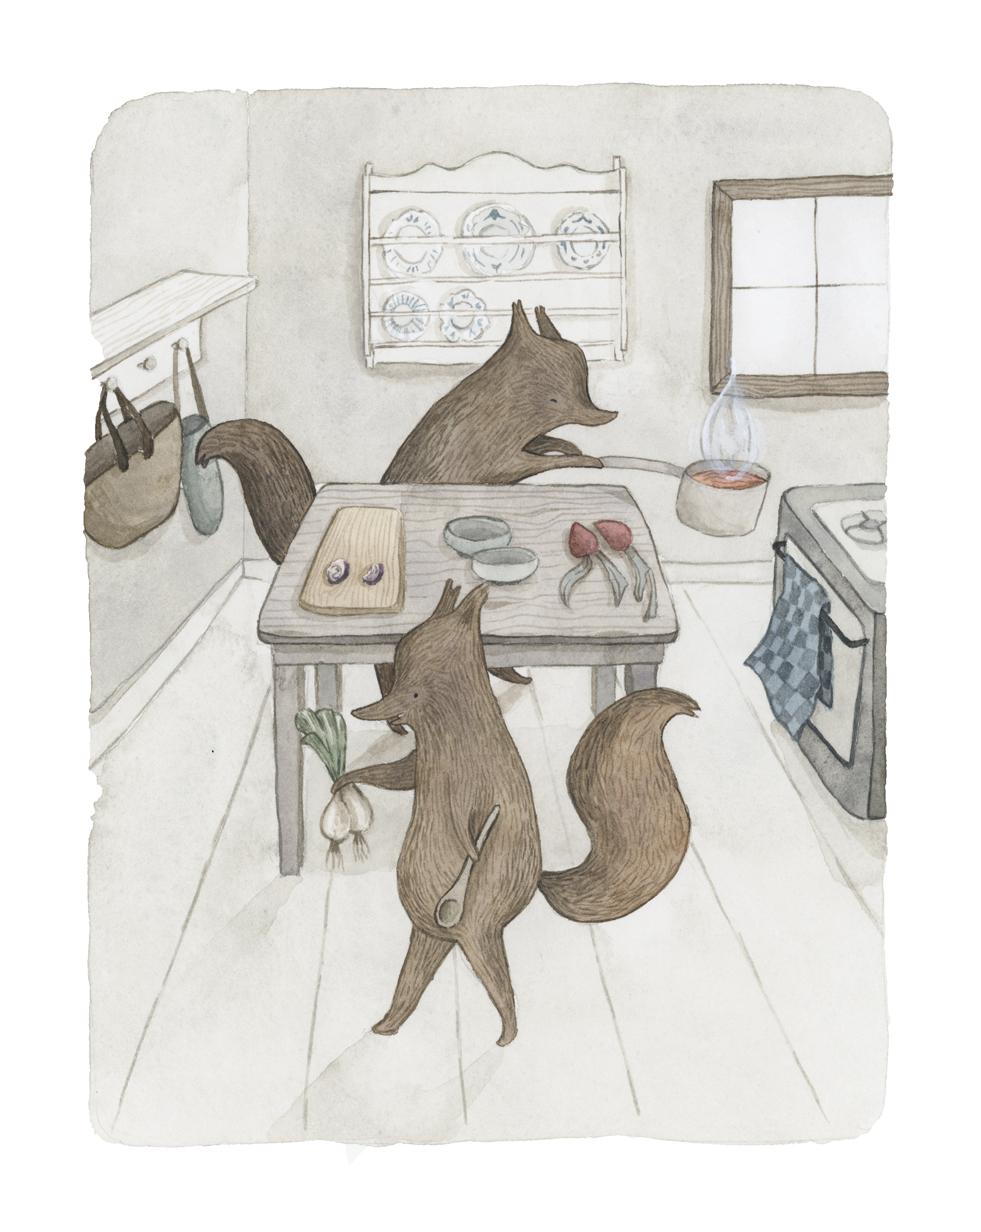 In_the_kitchen_web_1.jpg